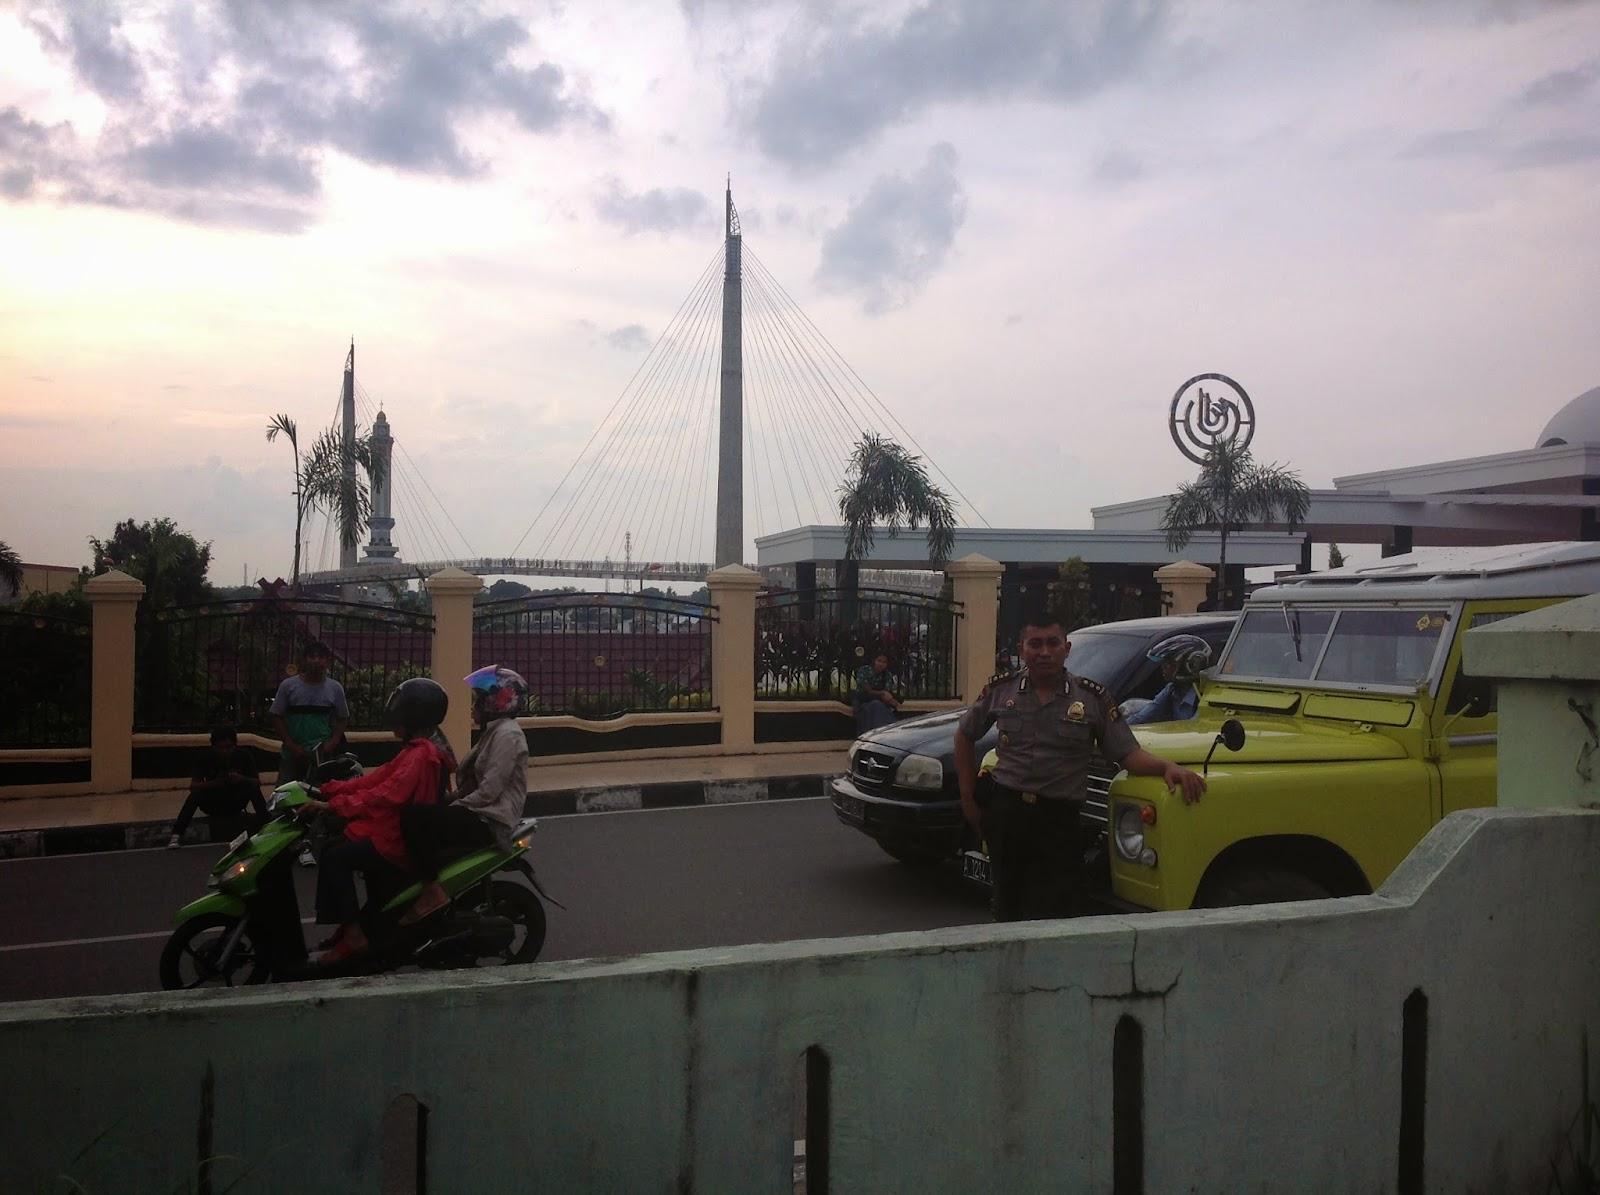 Menara Gentala Arasy Jembatan Pedestrian Ikon Kebanggaan Kota Jambi